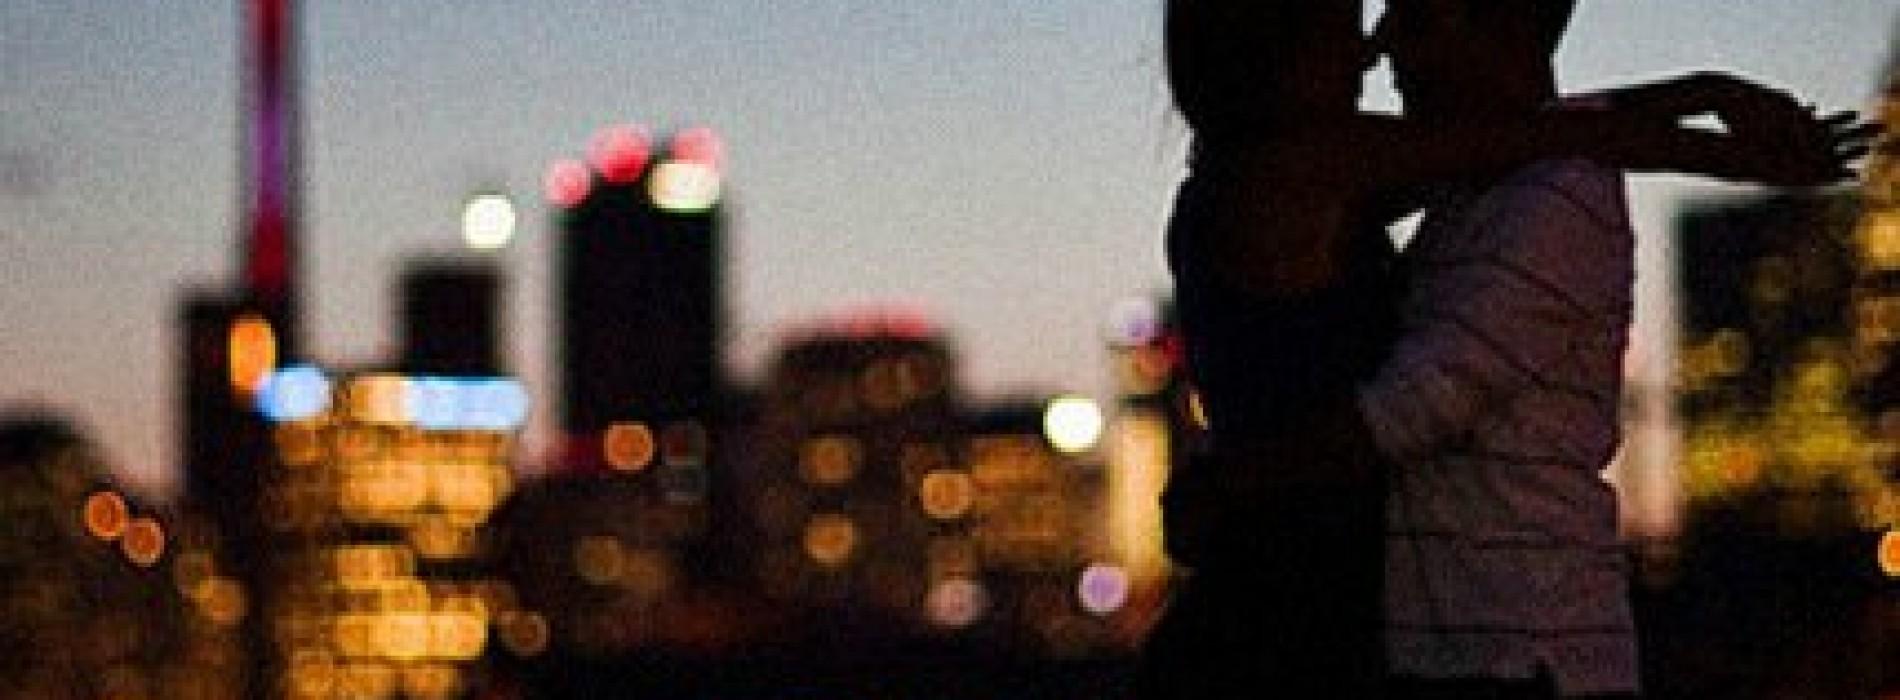 Jay Joel: Better Half Of Me (Deep House Remix)